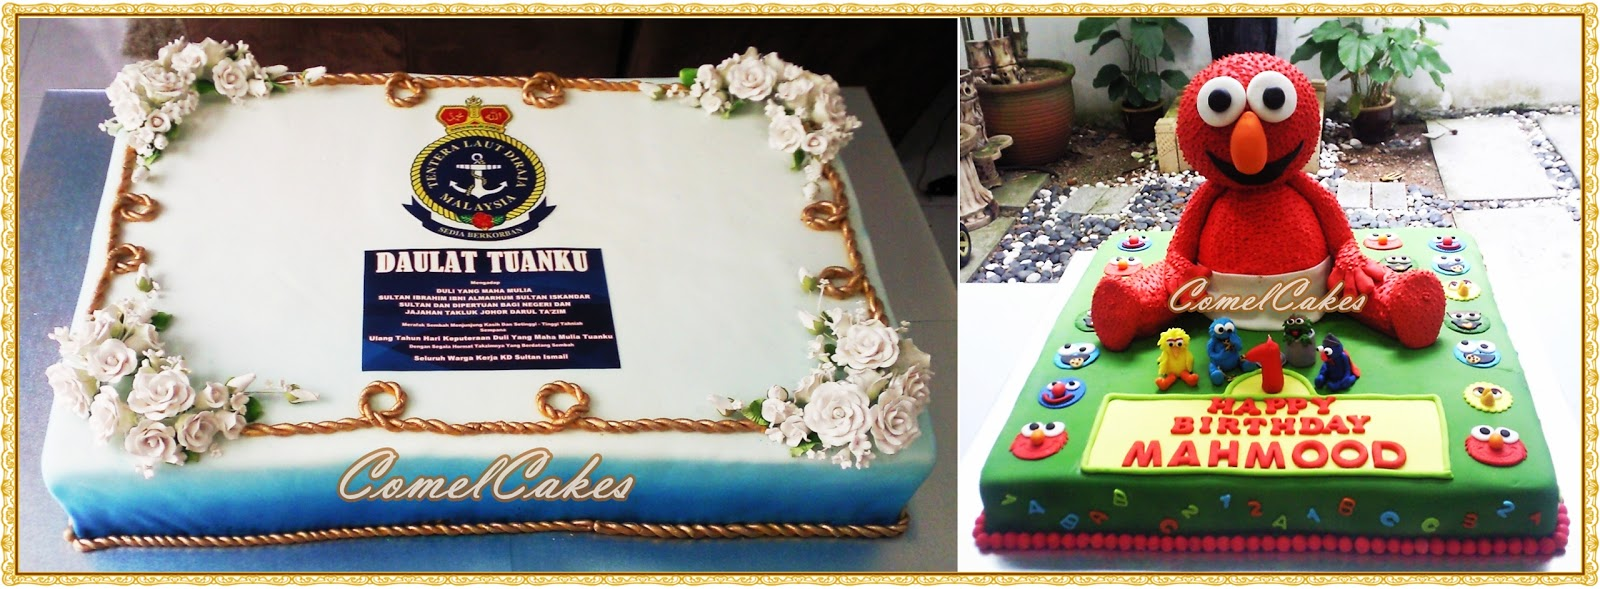 Comels Cakes Cupcakes Johor Bahru December 2011